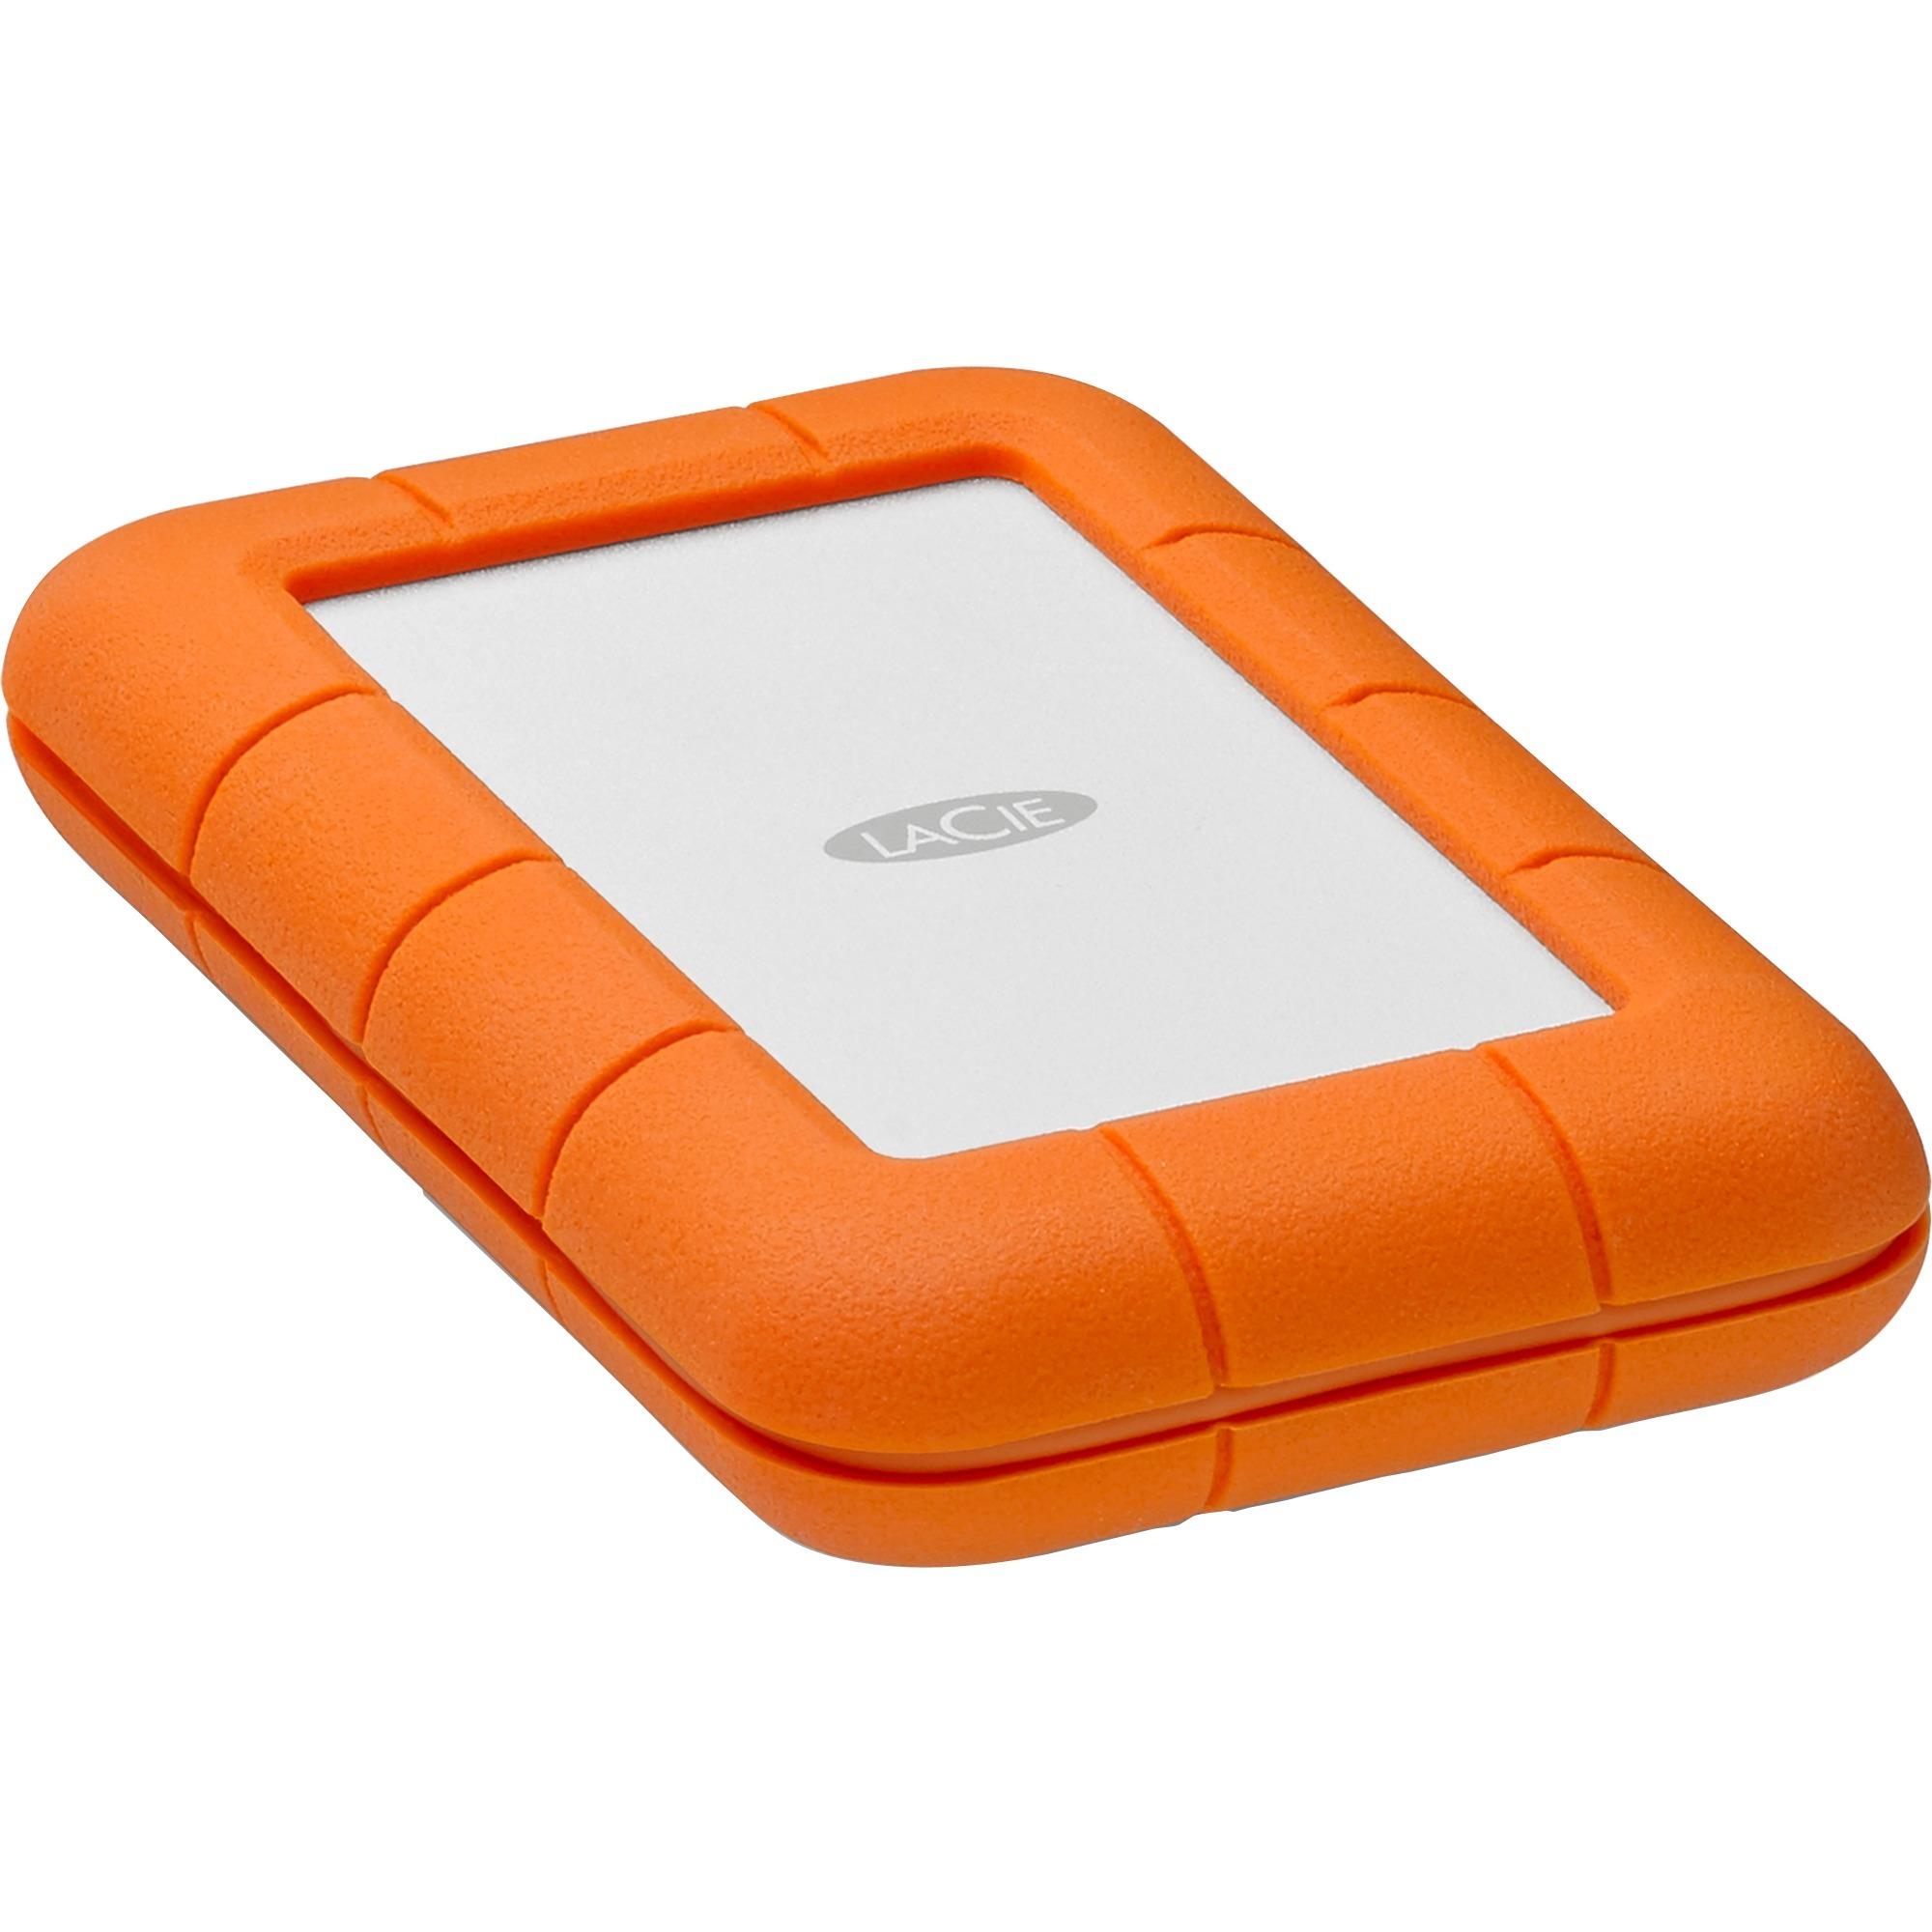 Rugged USB-C disco duro externo 4000 GB Naranja, Plata, Unidad de disco duro